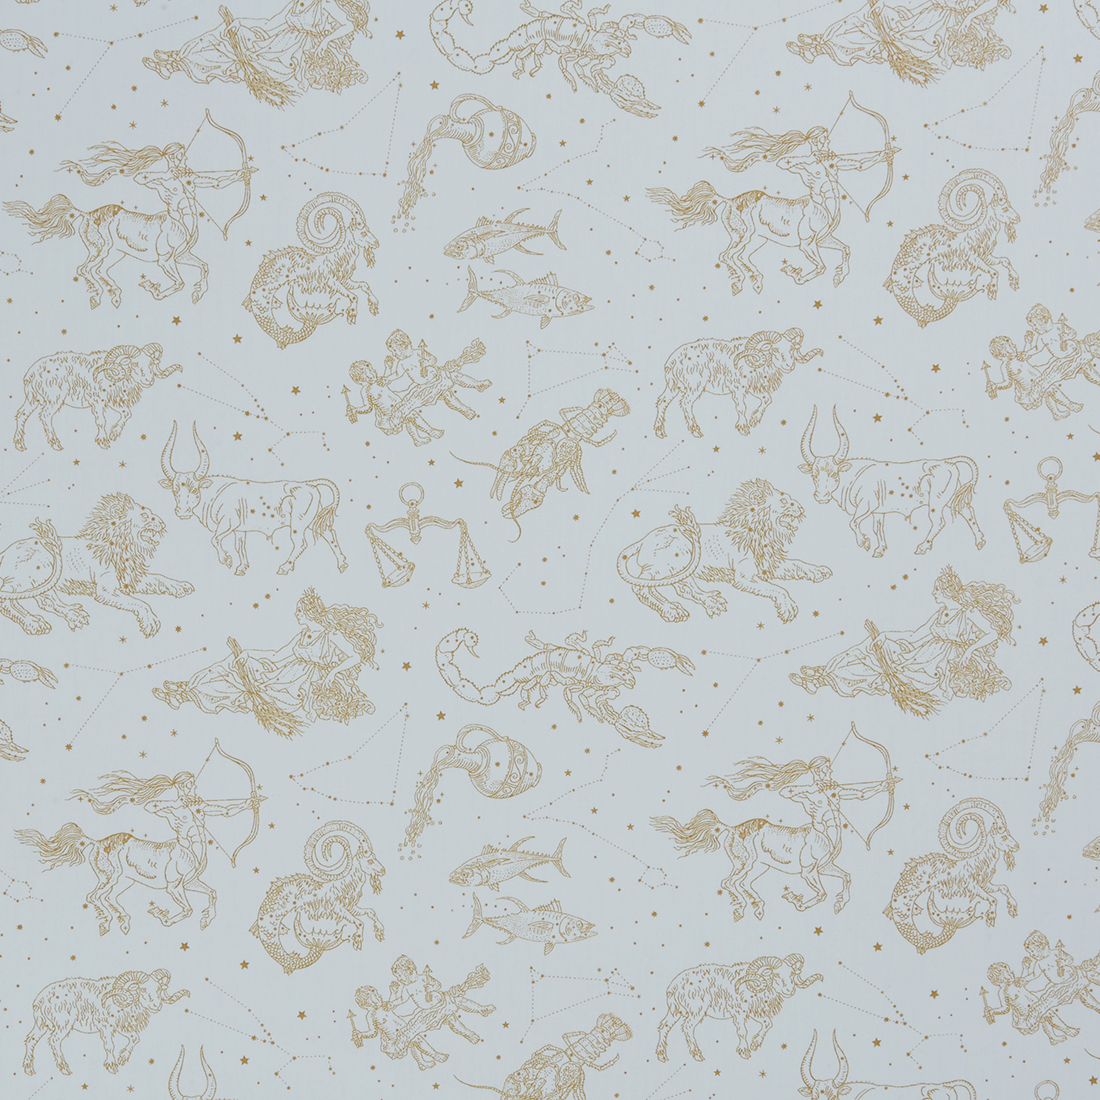 Astrology Ivory Dress Fabric